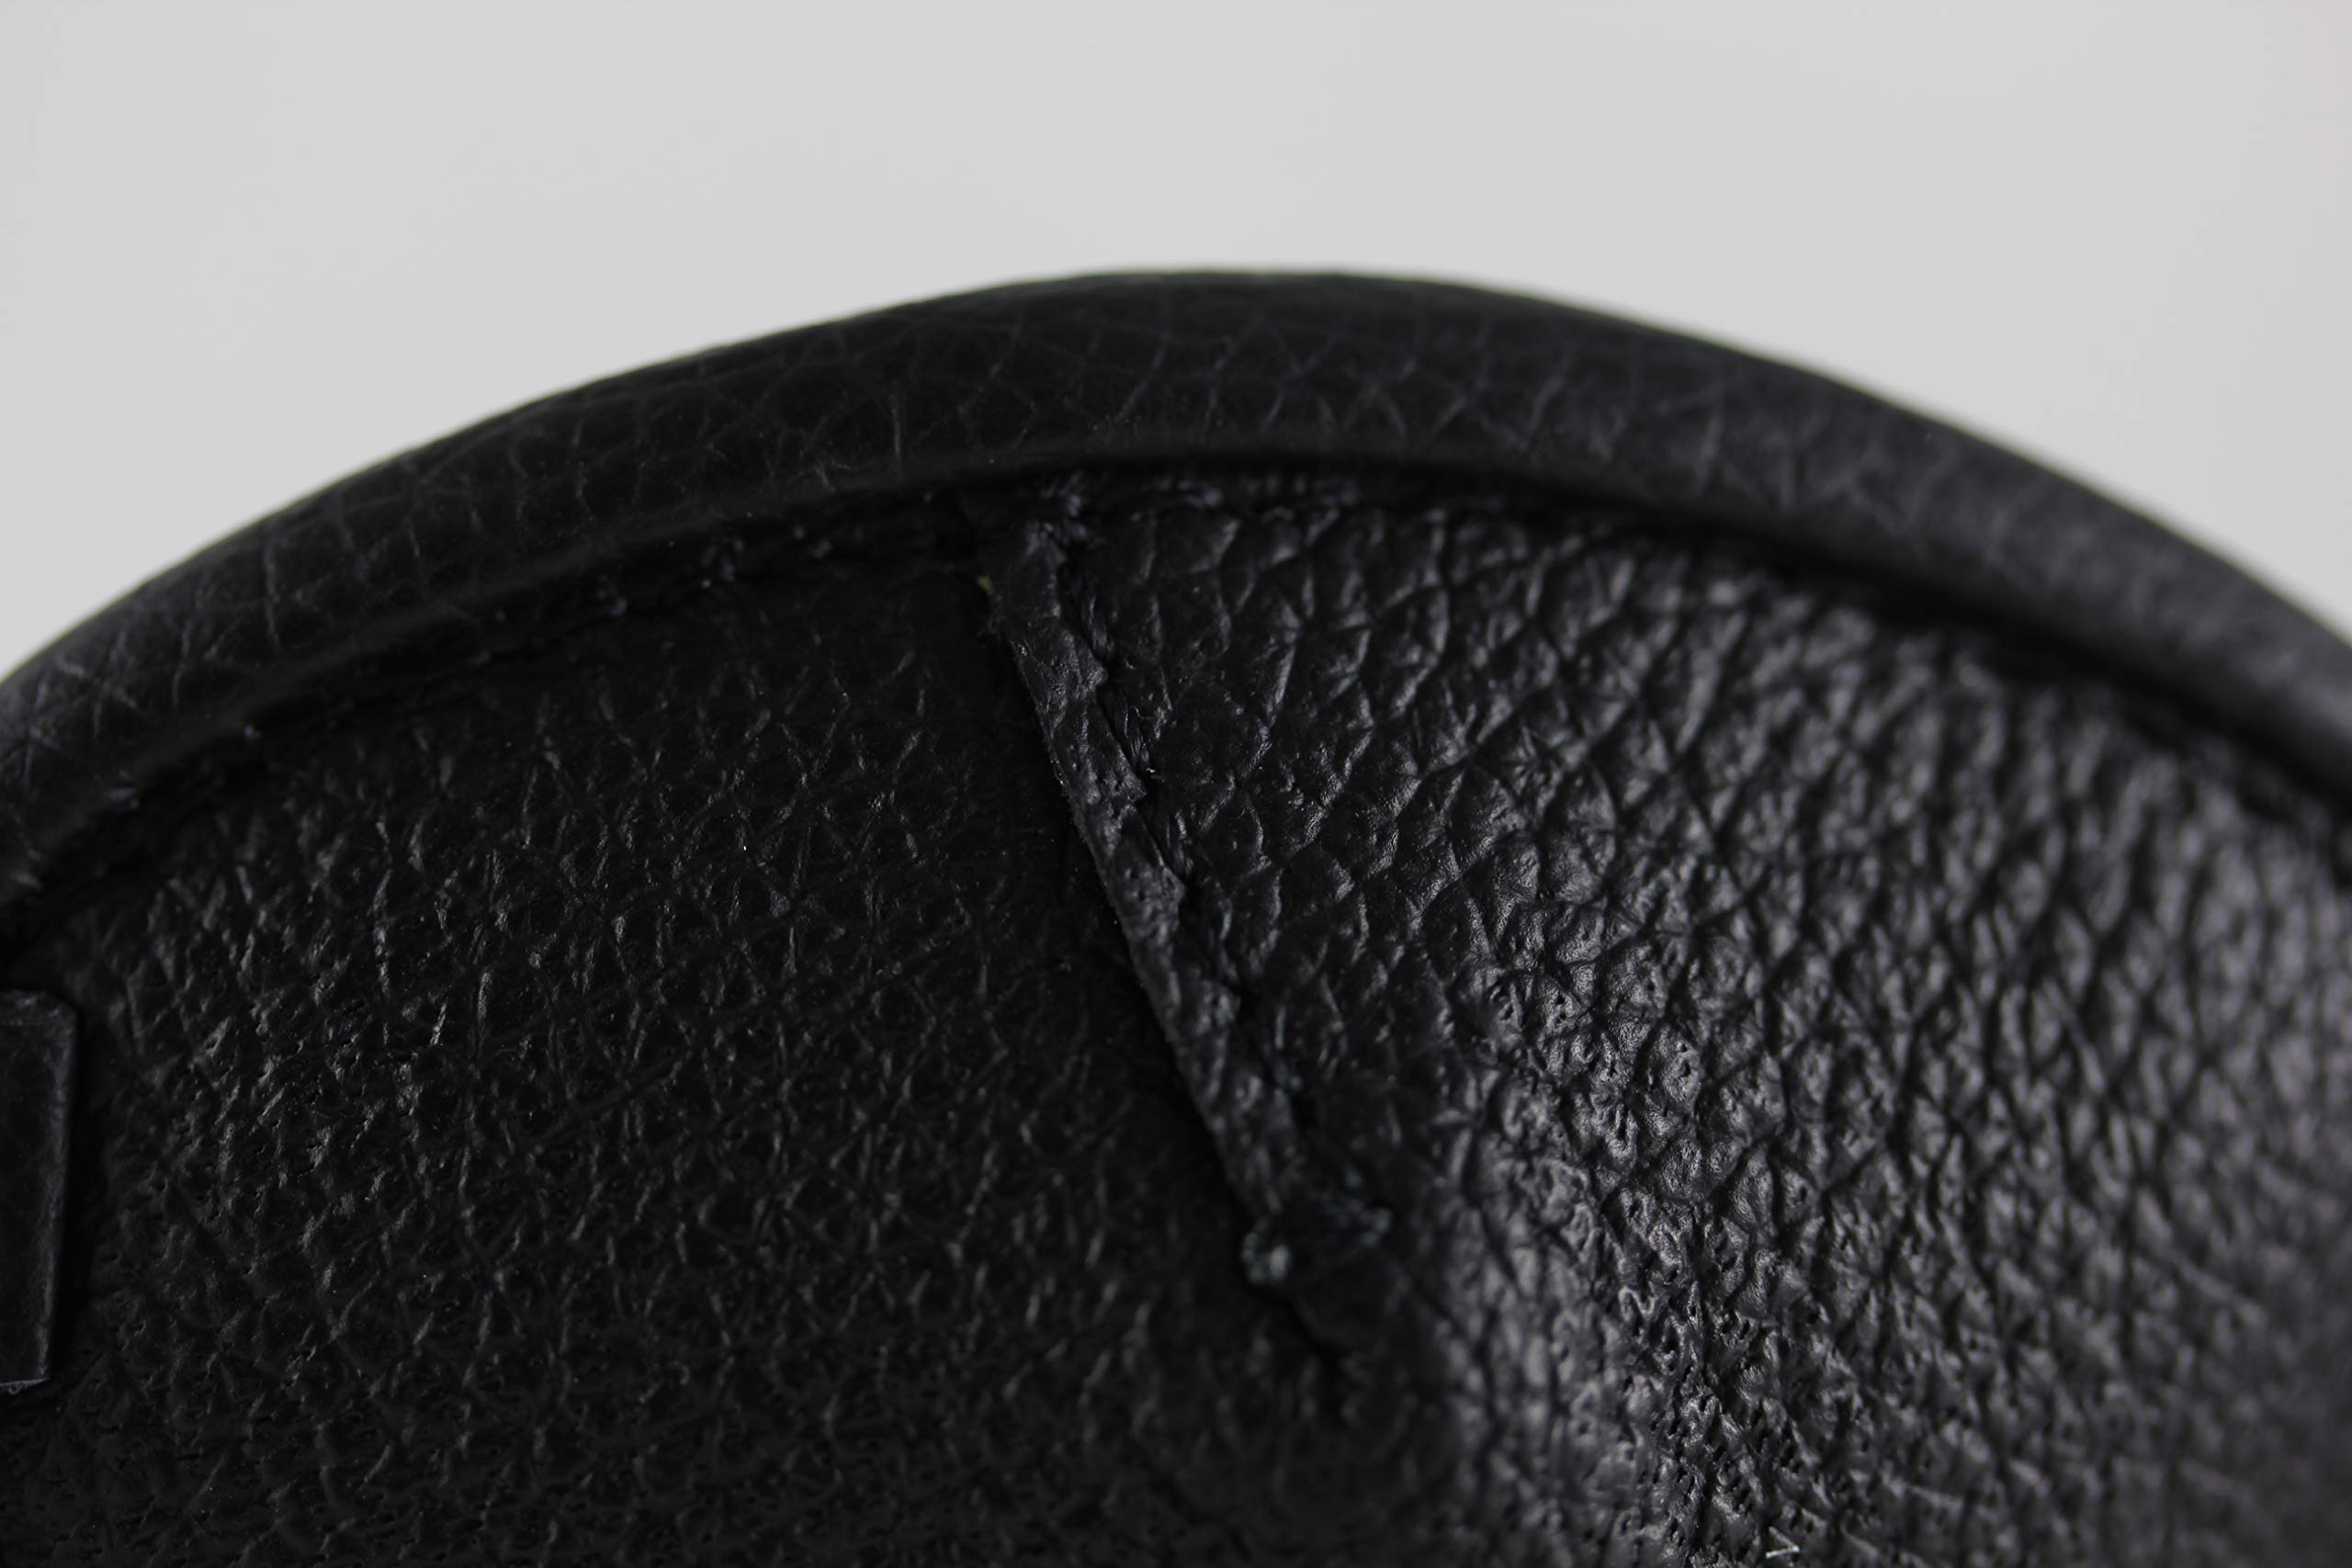 Leather Eyepatch. Slight Convex Eye Patch (Right Eye, Full Size Black) by Desantis Leather Goods (Image #8)